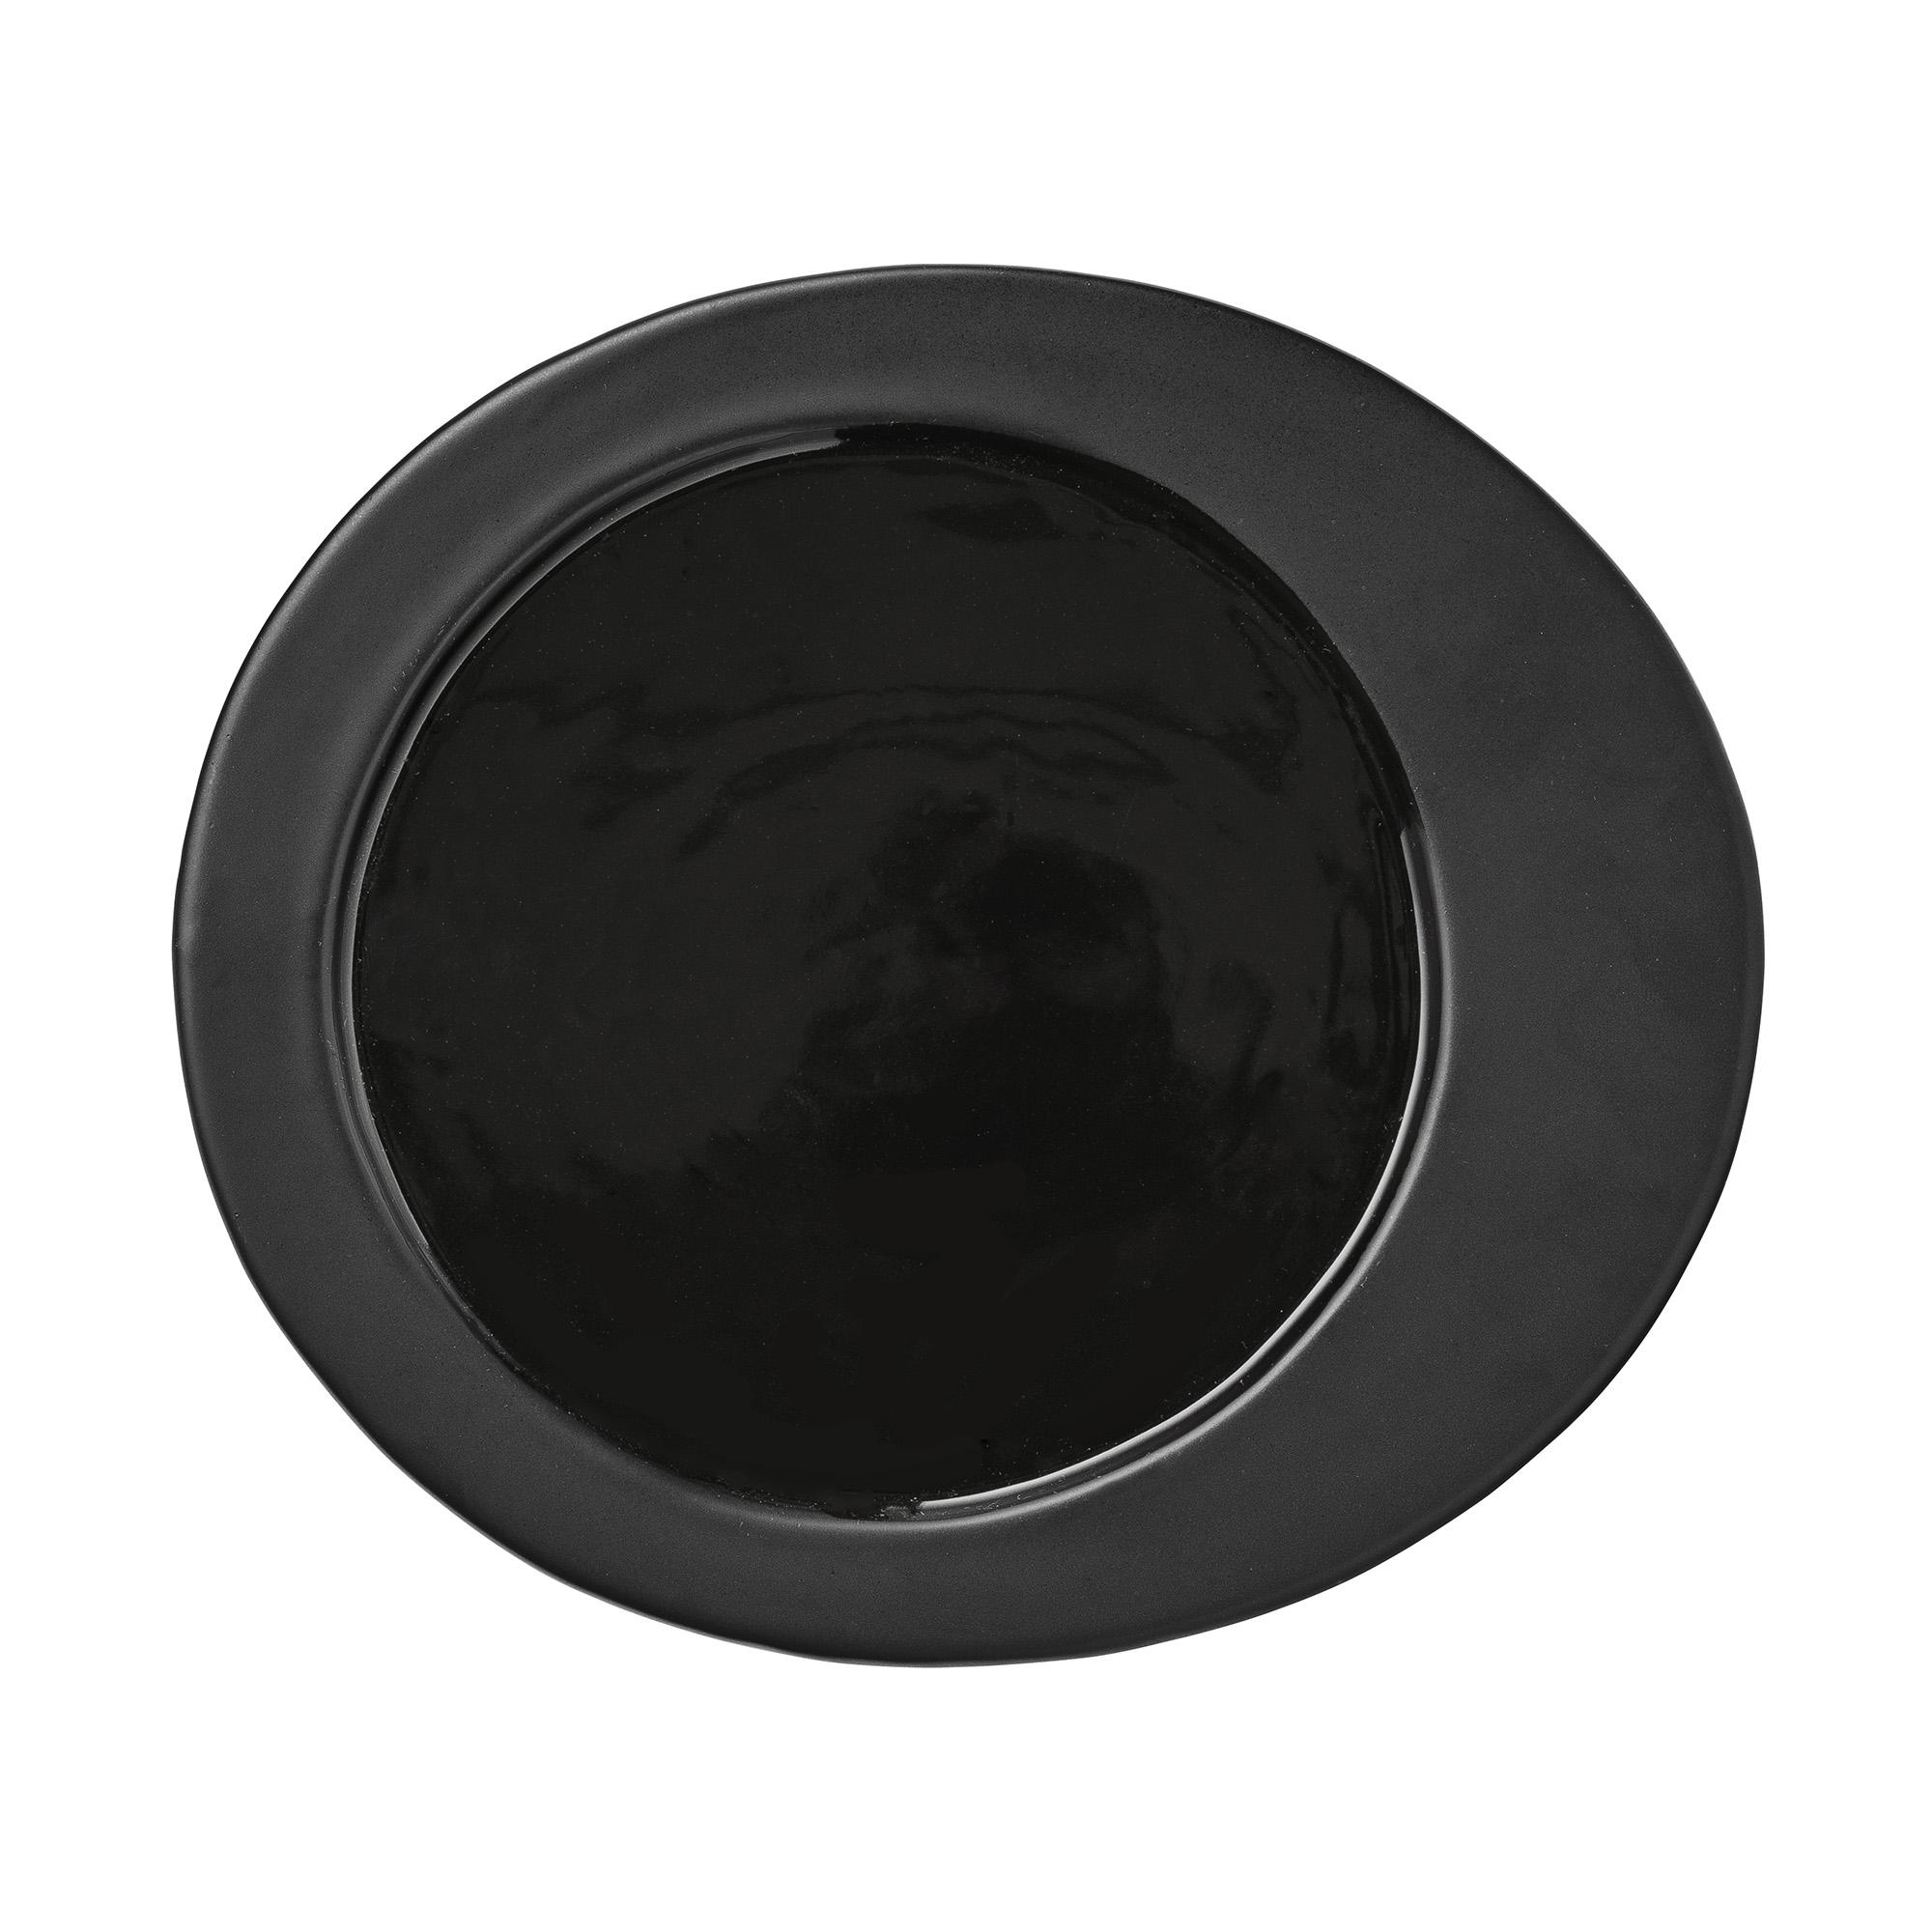 Farfurie Gitte Black Ceramica O20 cm